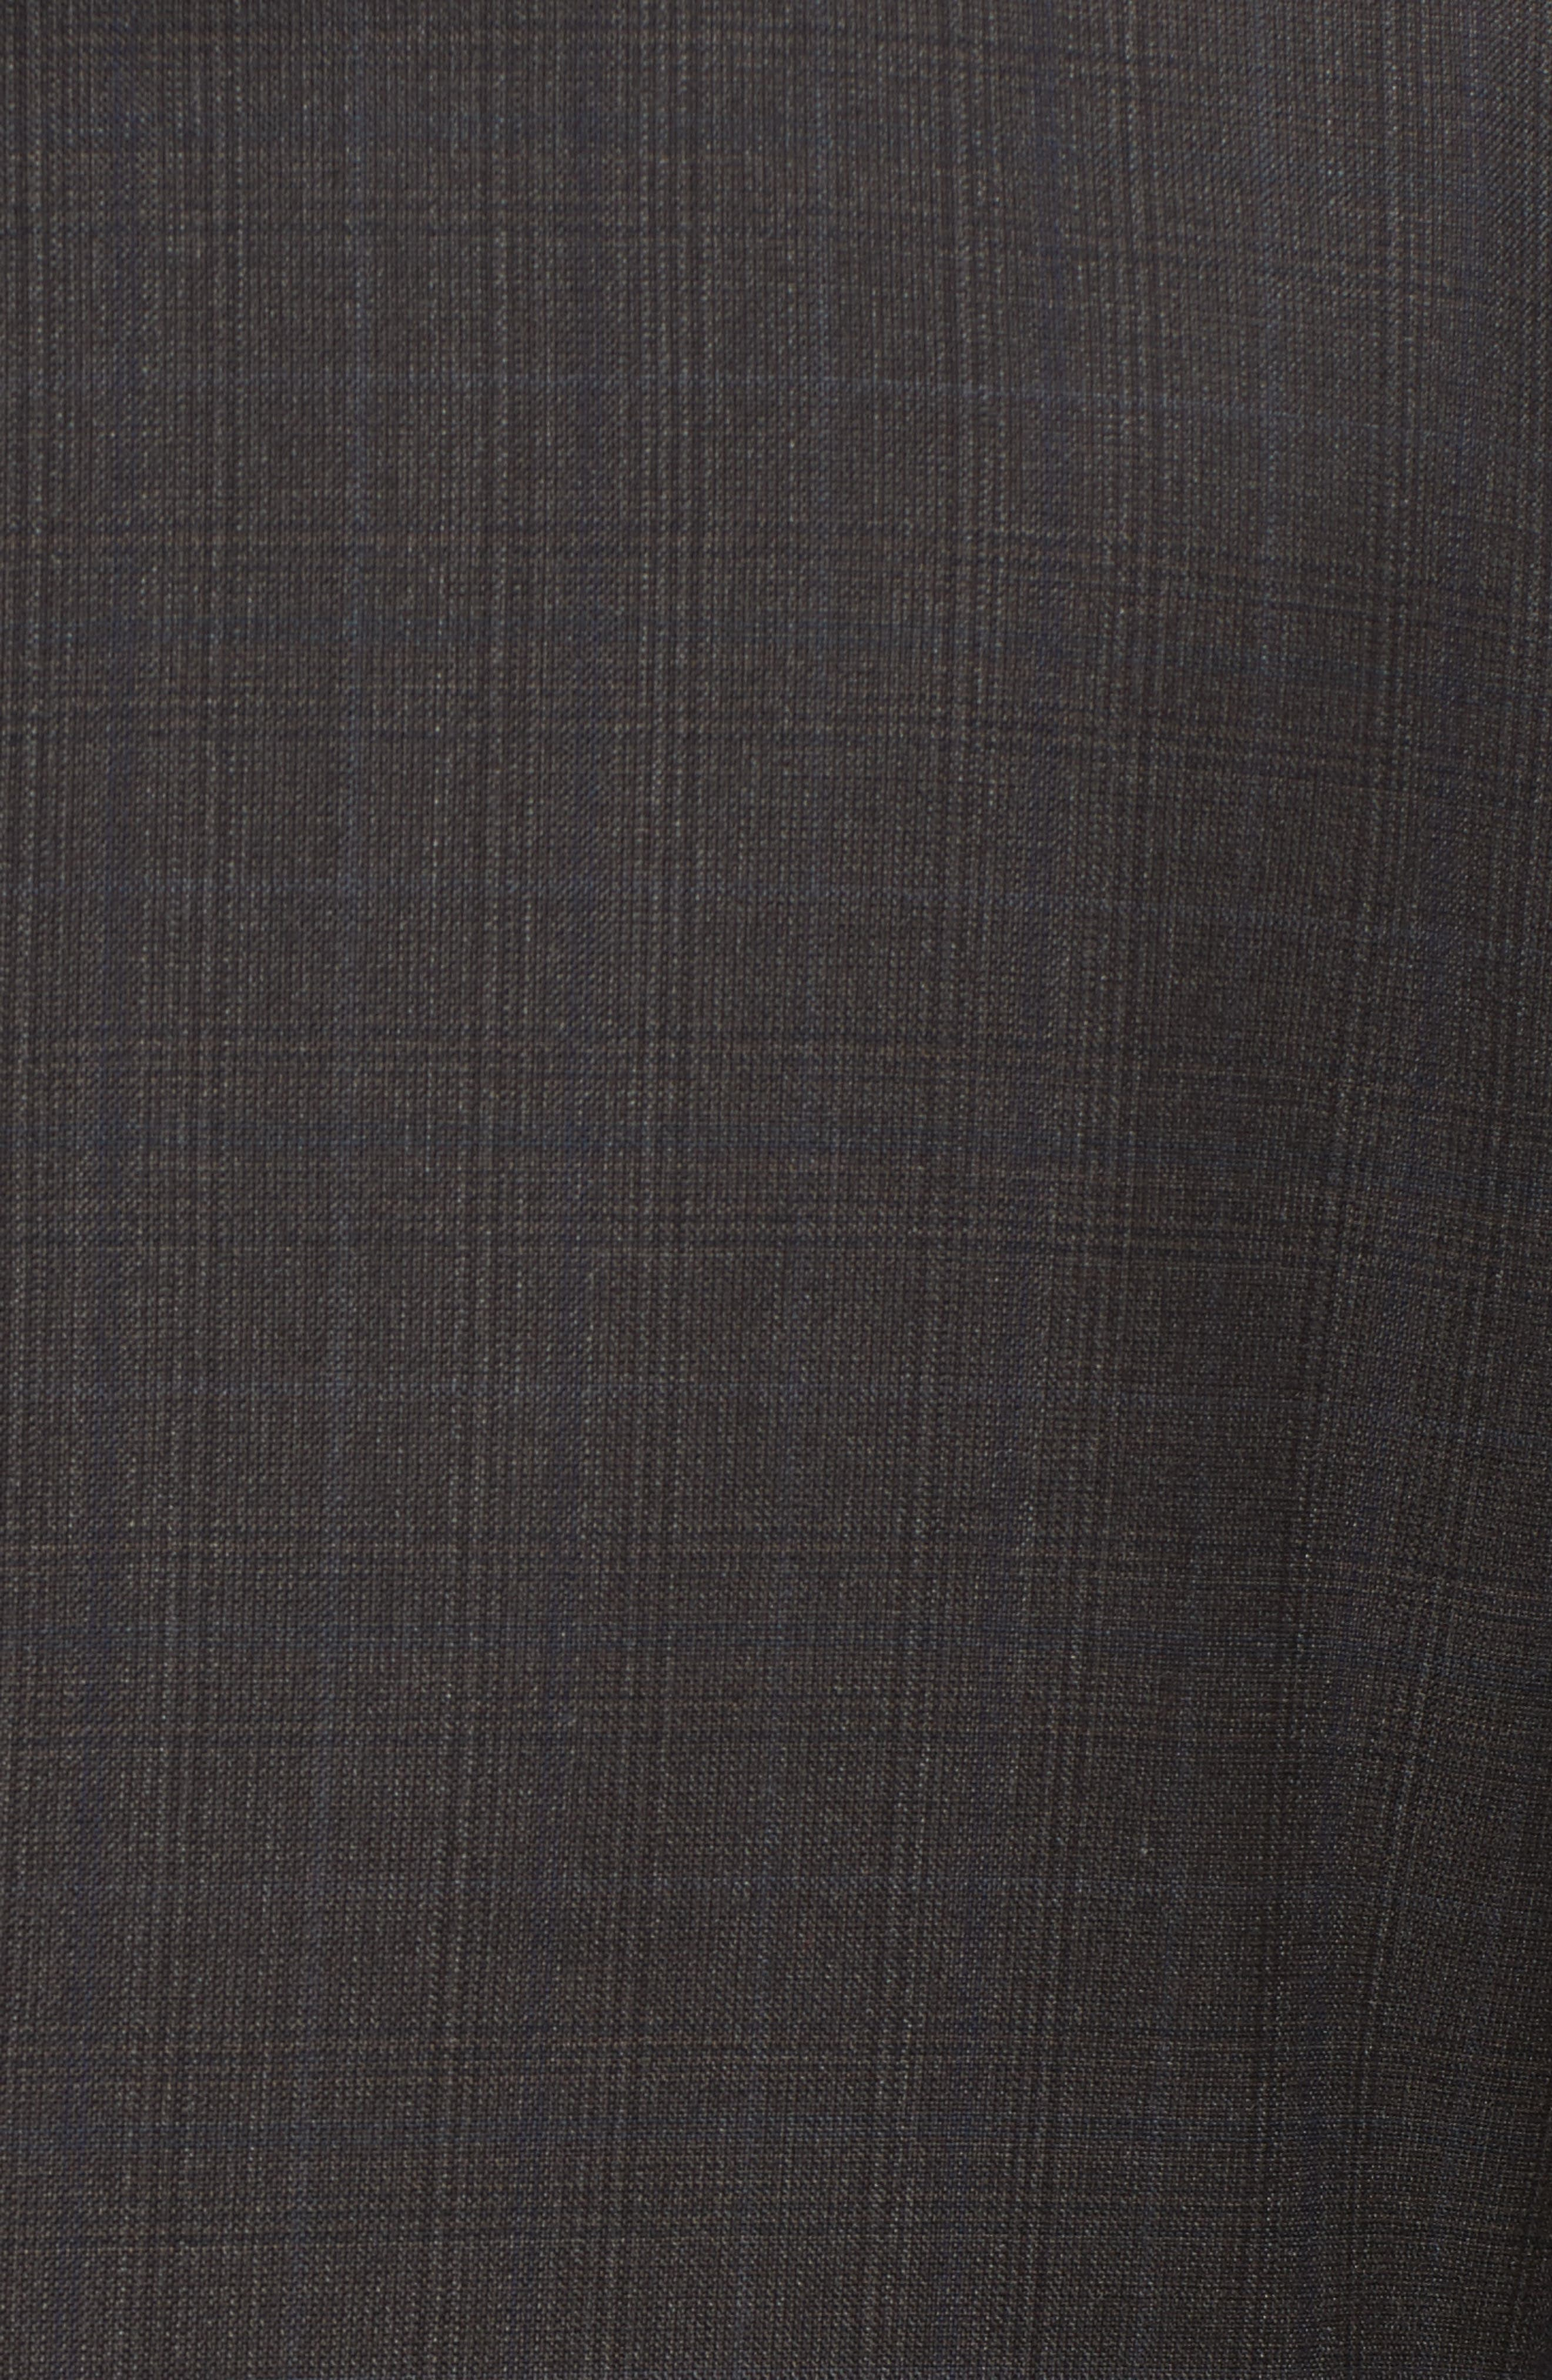 Classic B Fit Check Wool & Cashmere Suit,                             Alternate thumbnail 7, color,                             200